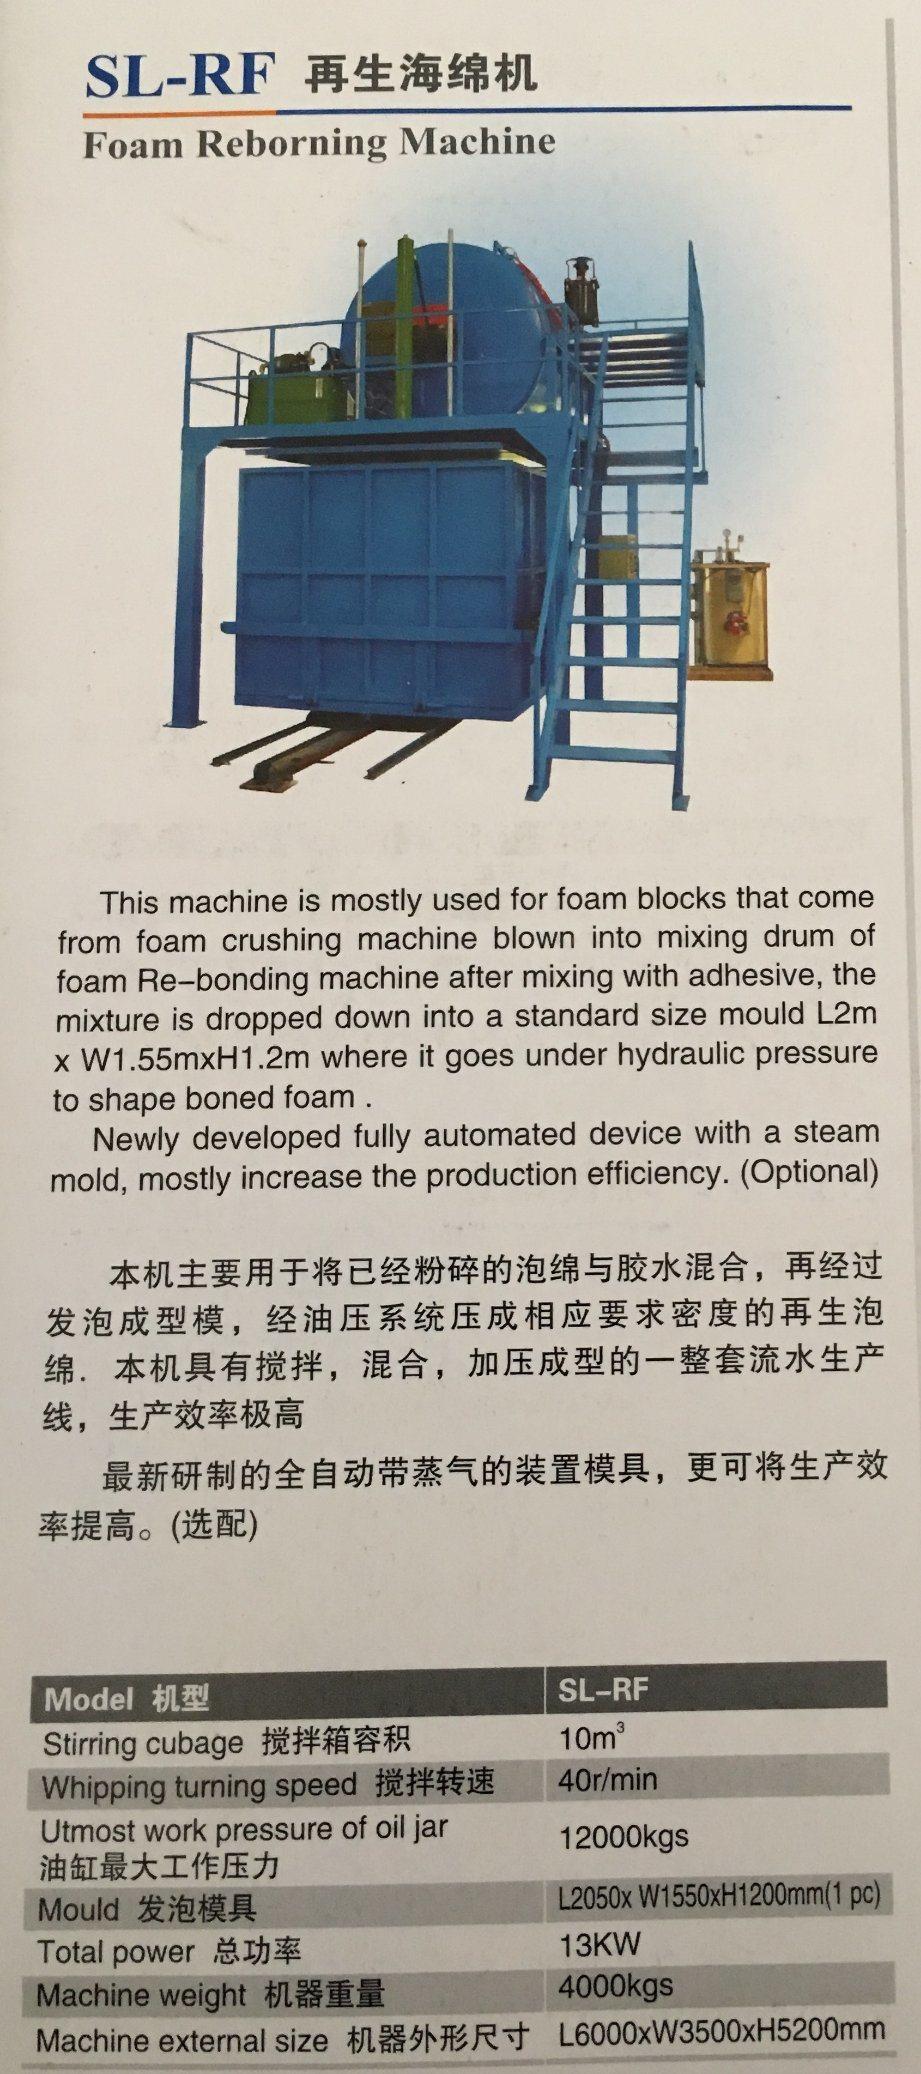 PU Foam Reborning Machine for Twice-Bond Sponge